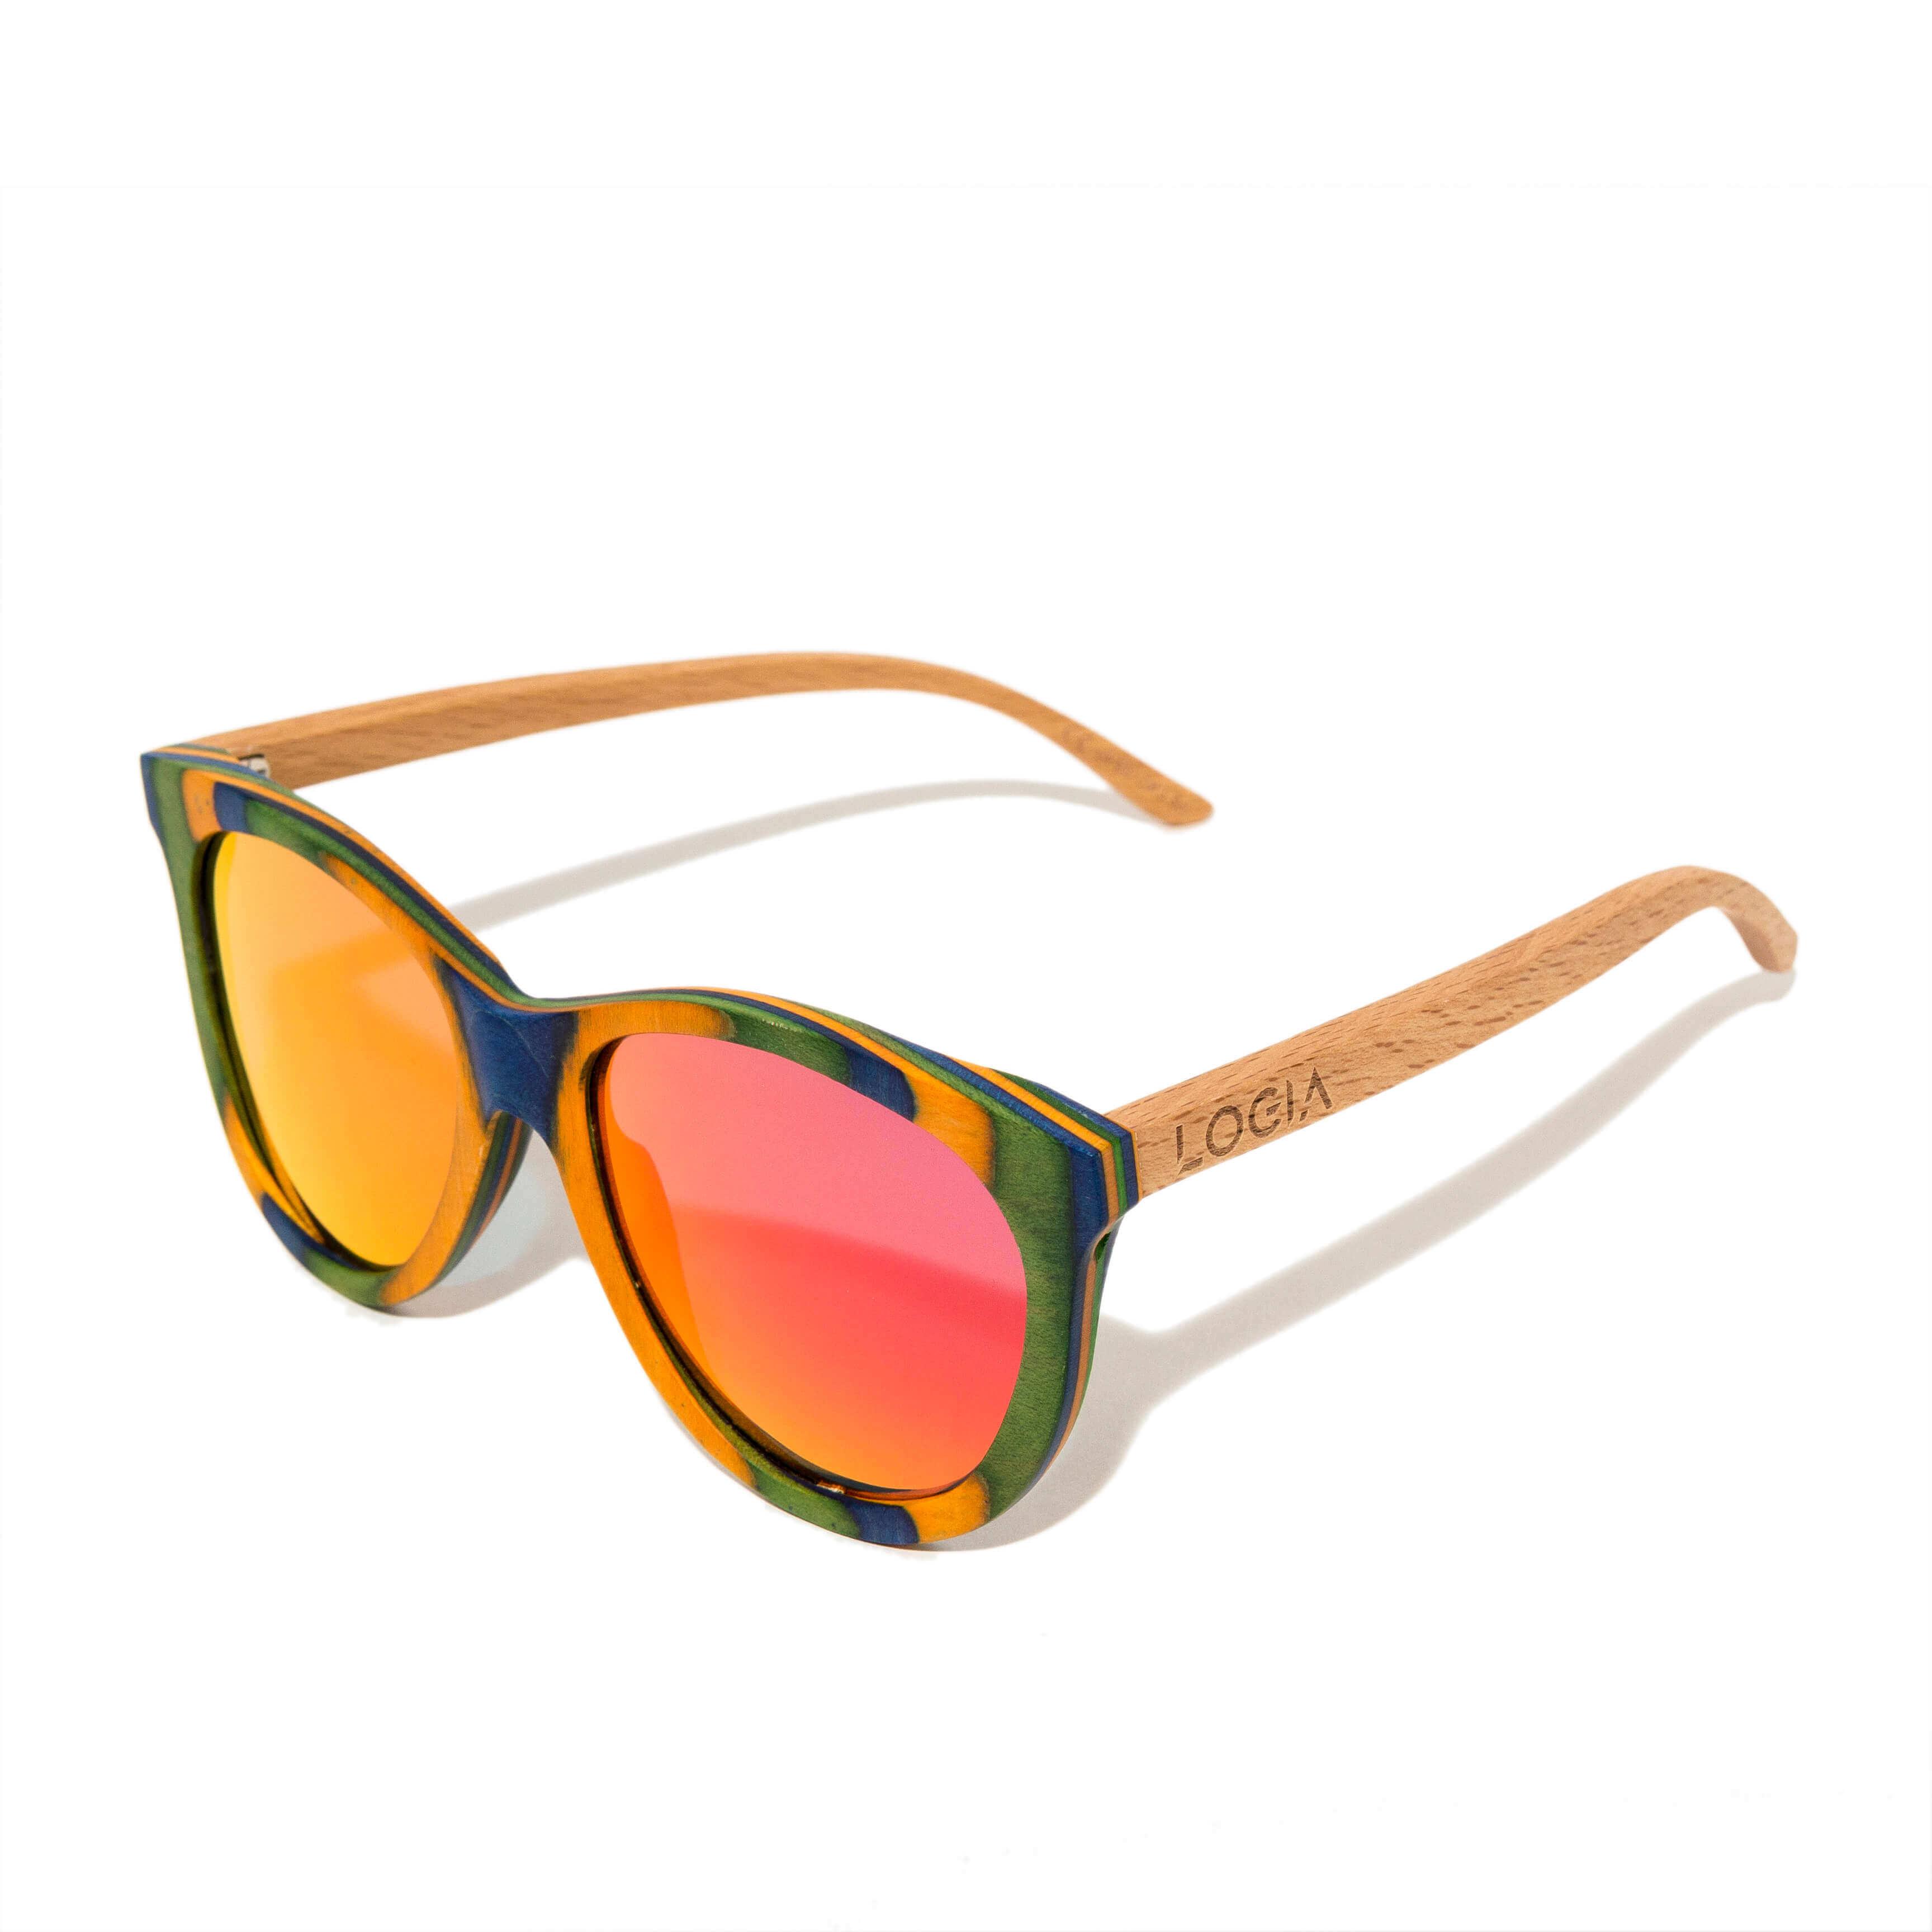 Óculos de sol Logia Lifestyle Welcome